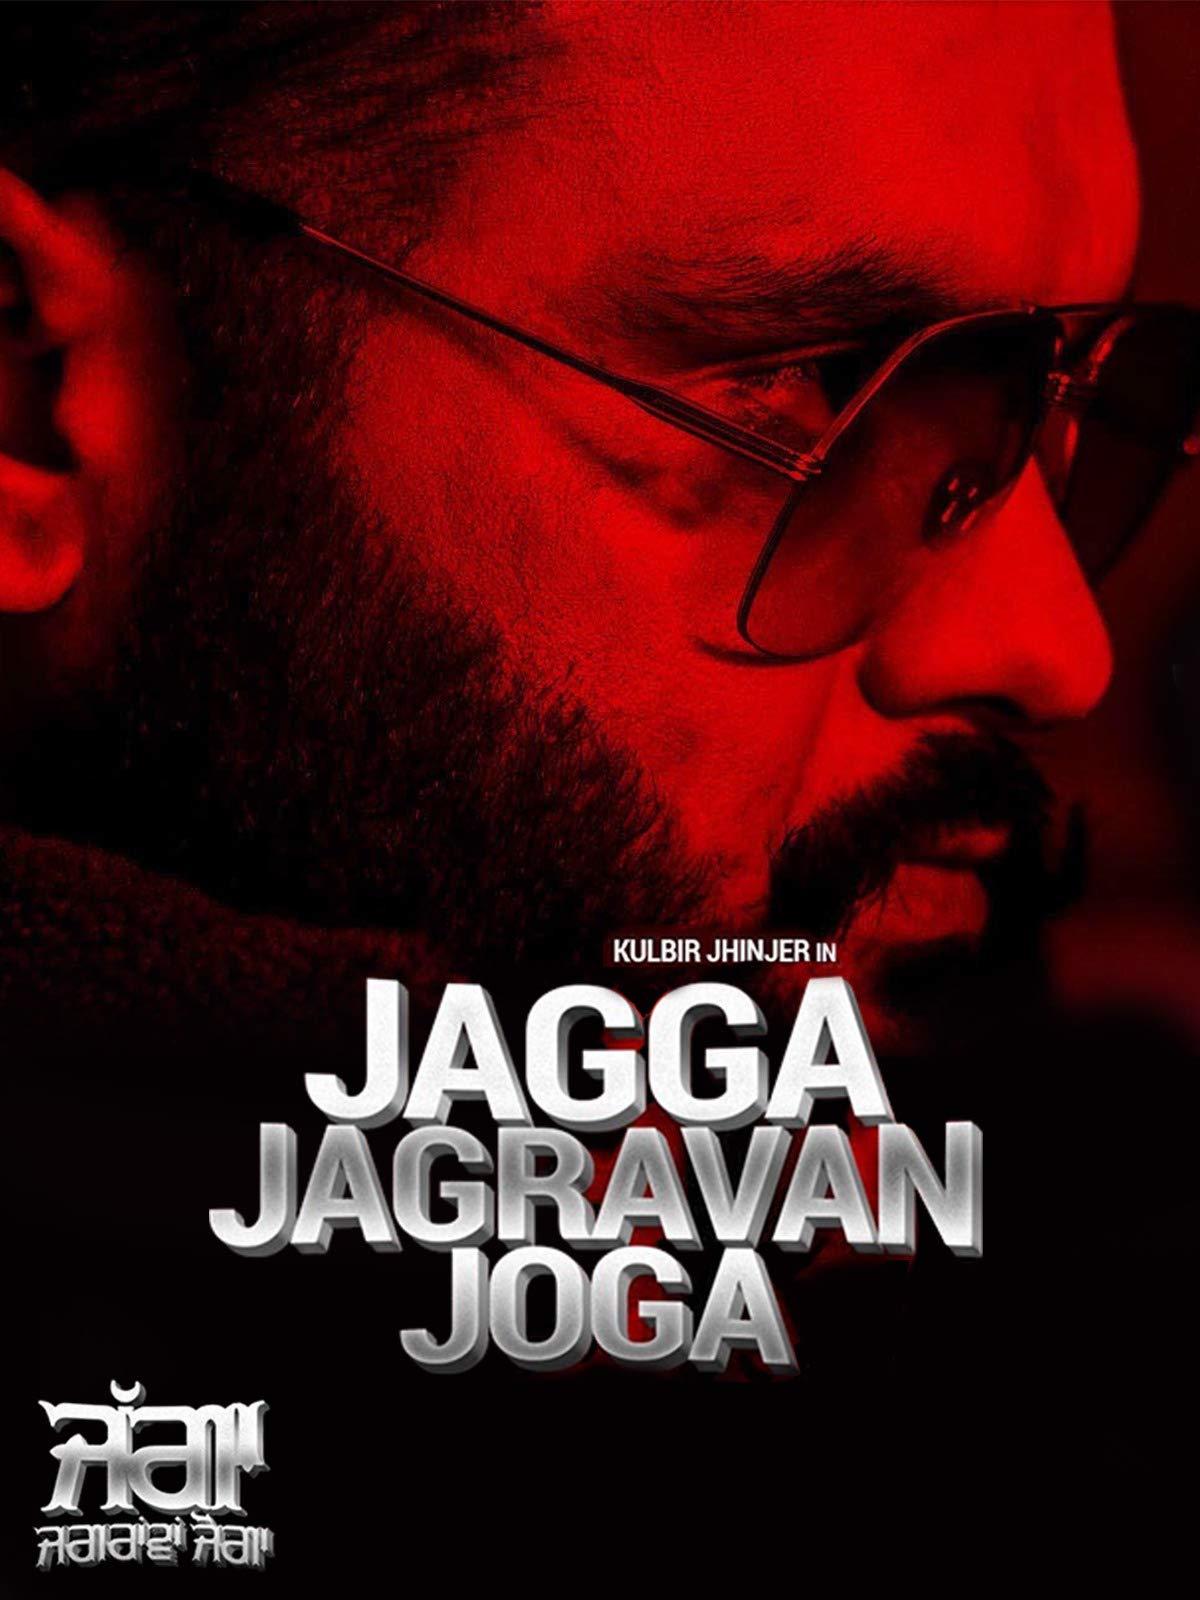 Jaga Jagravan Joga